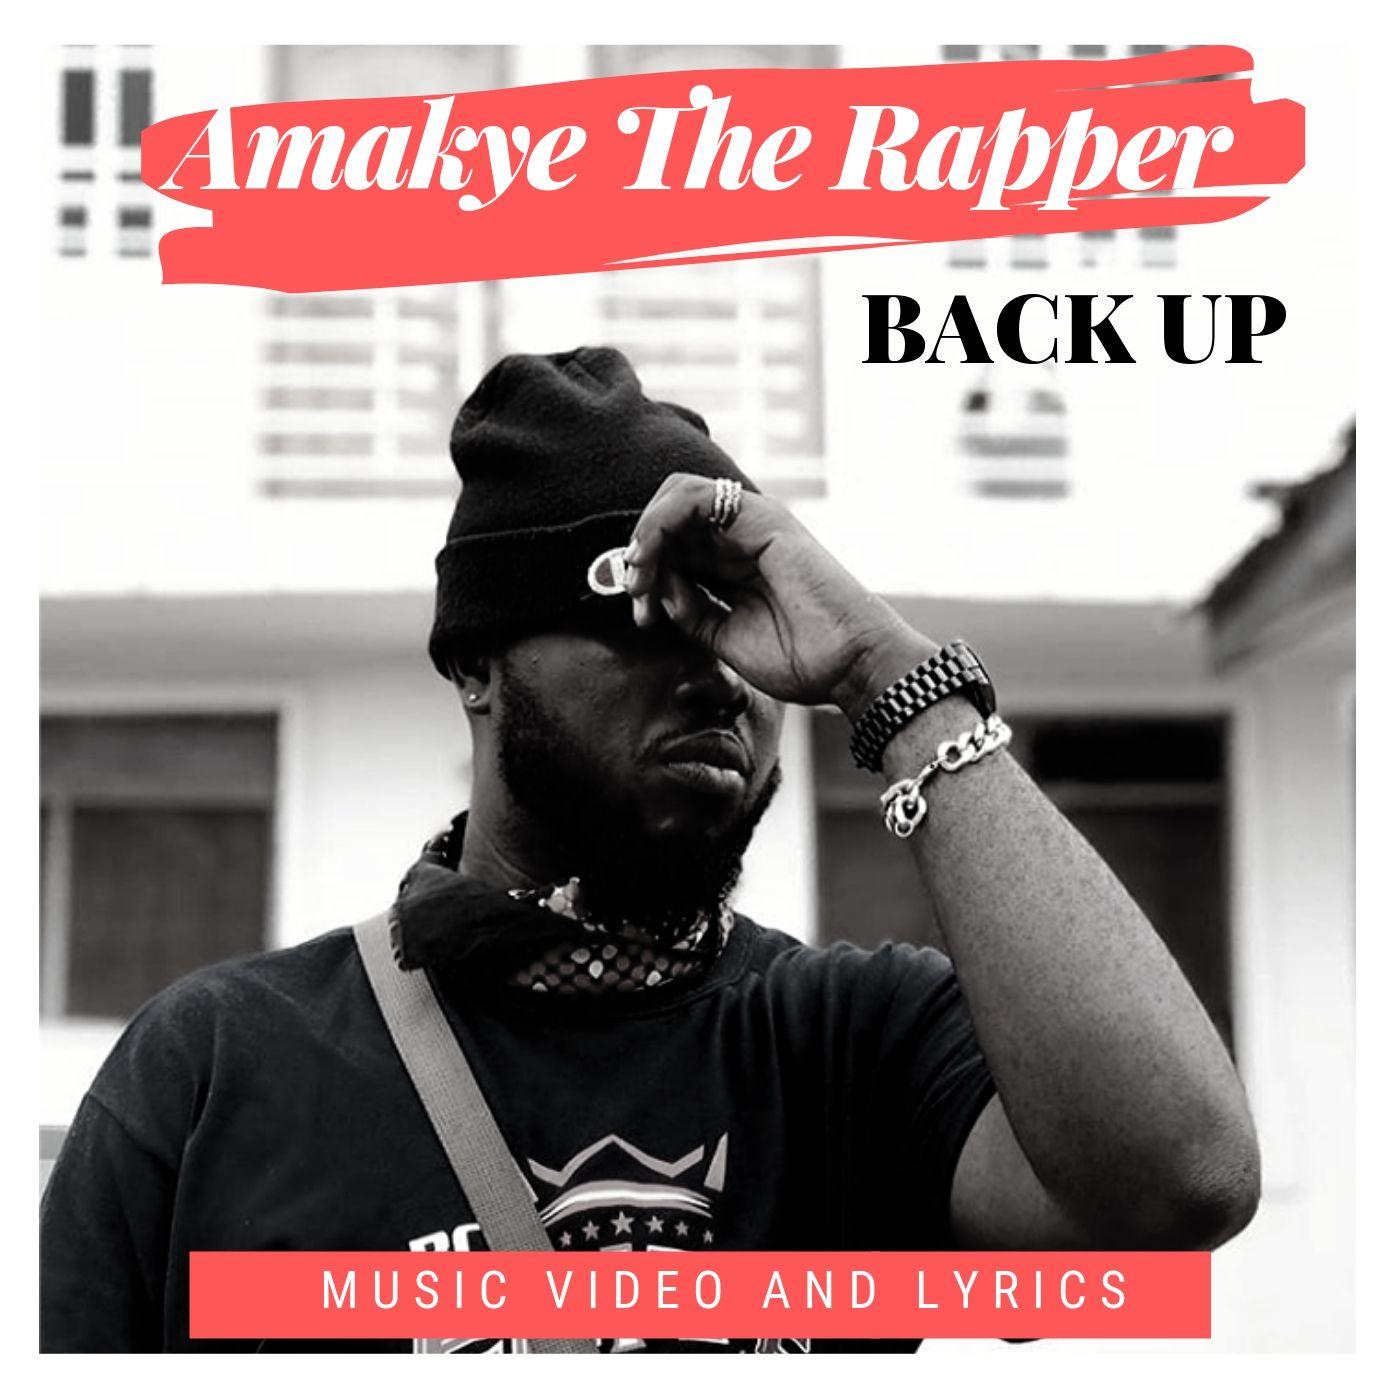 amakye the rapper back up